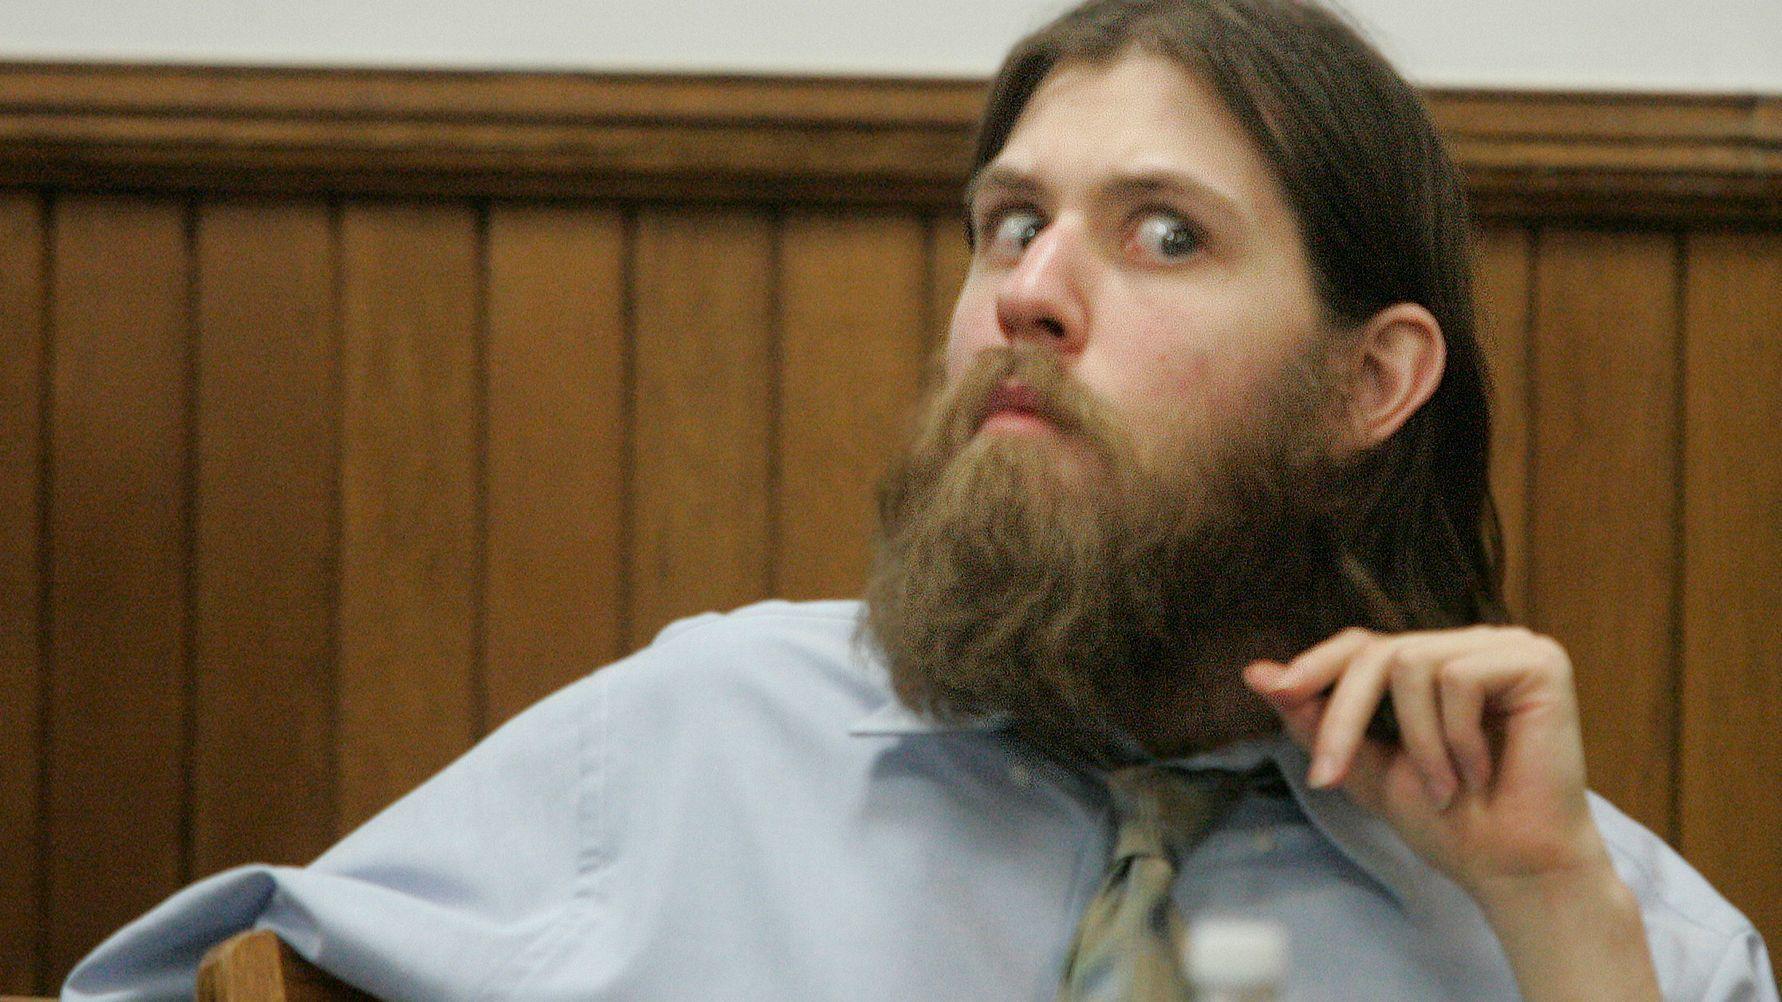 Virginia executes a killer despite pressure from mental health advocates